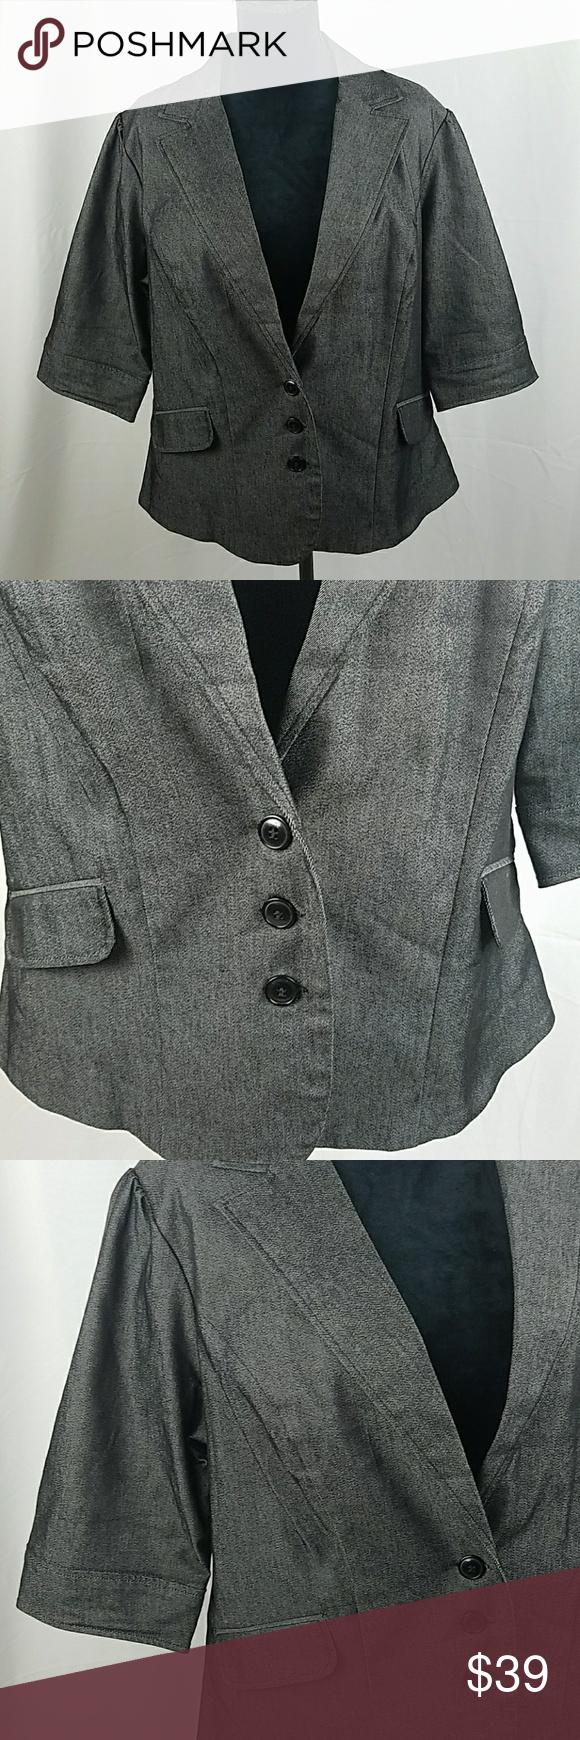 9e1d1e7b694 TORRID plus size women 2X gray denim jacket TORRID plus size women ...